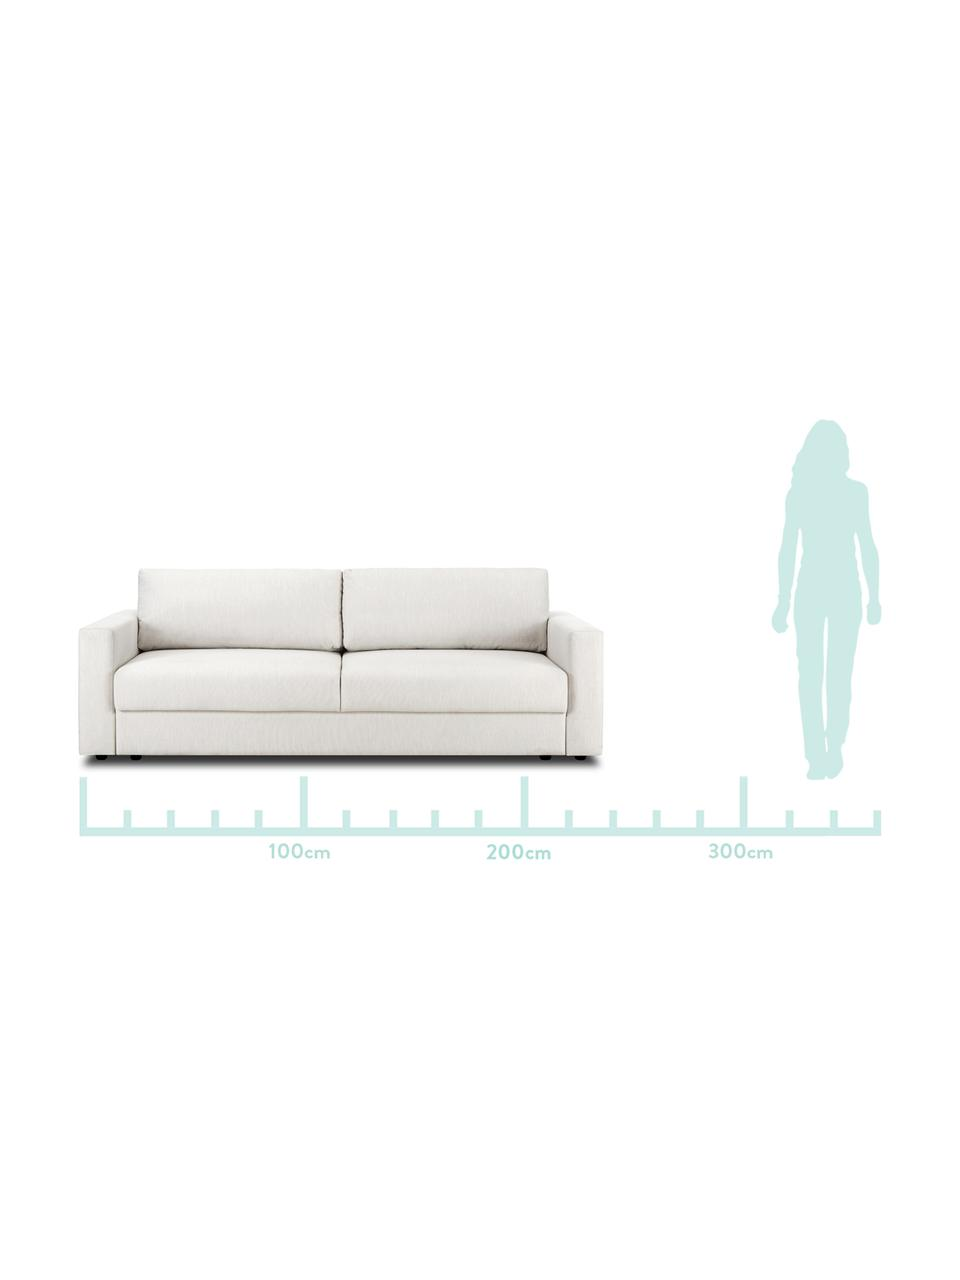 Schlafsofa Tasha in Beige, Bezug: 100% Polyester Der hochwe, Füße: Massives Kiefernholz, Spe, Füße: Kunststoff, Webstoff Beige, B 235 x T 100 cm